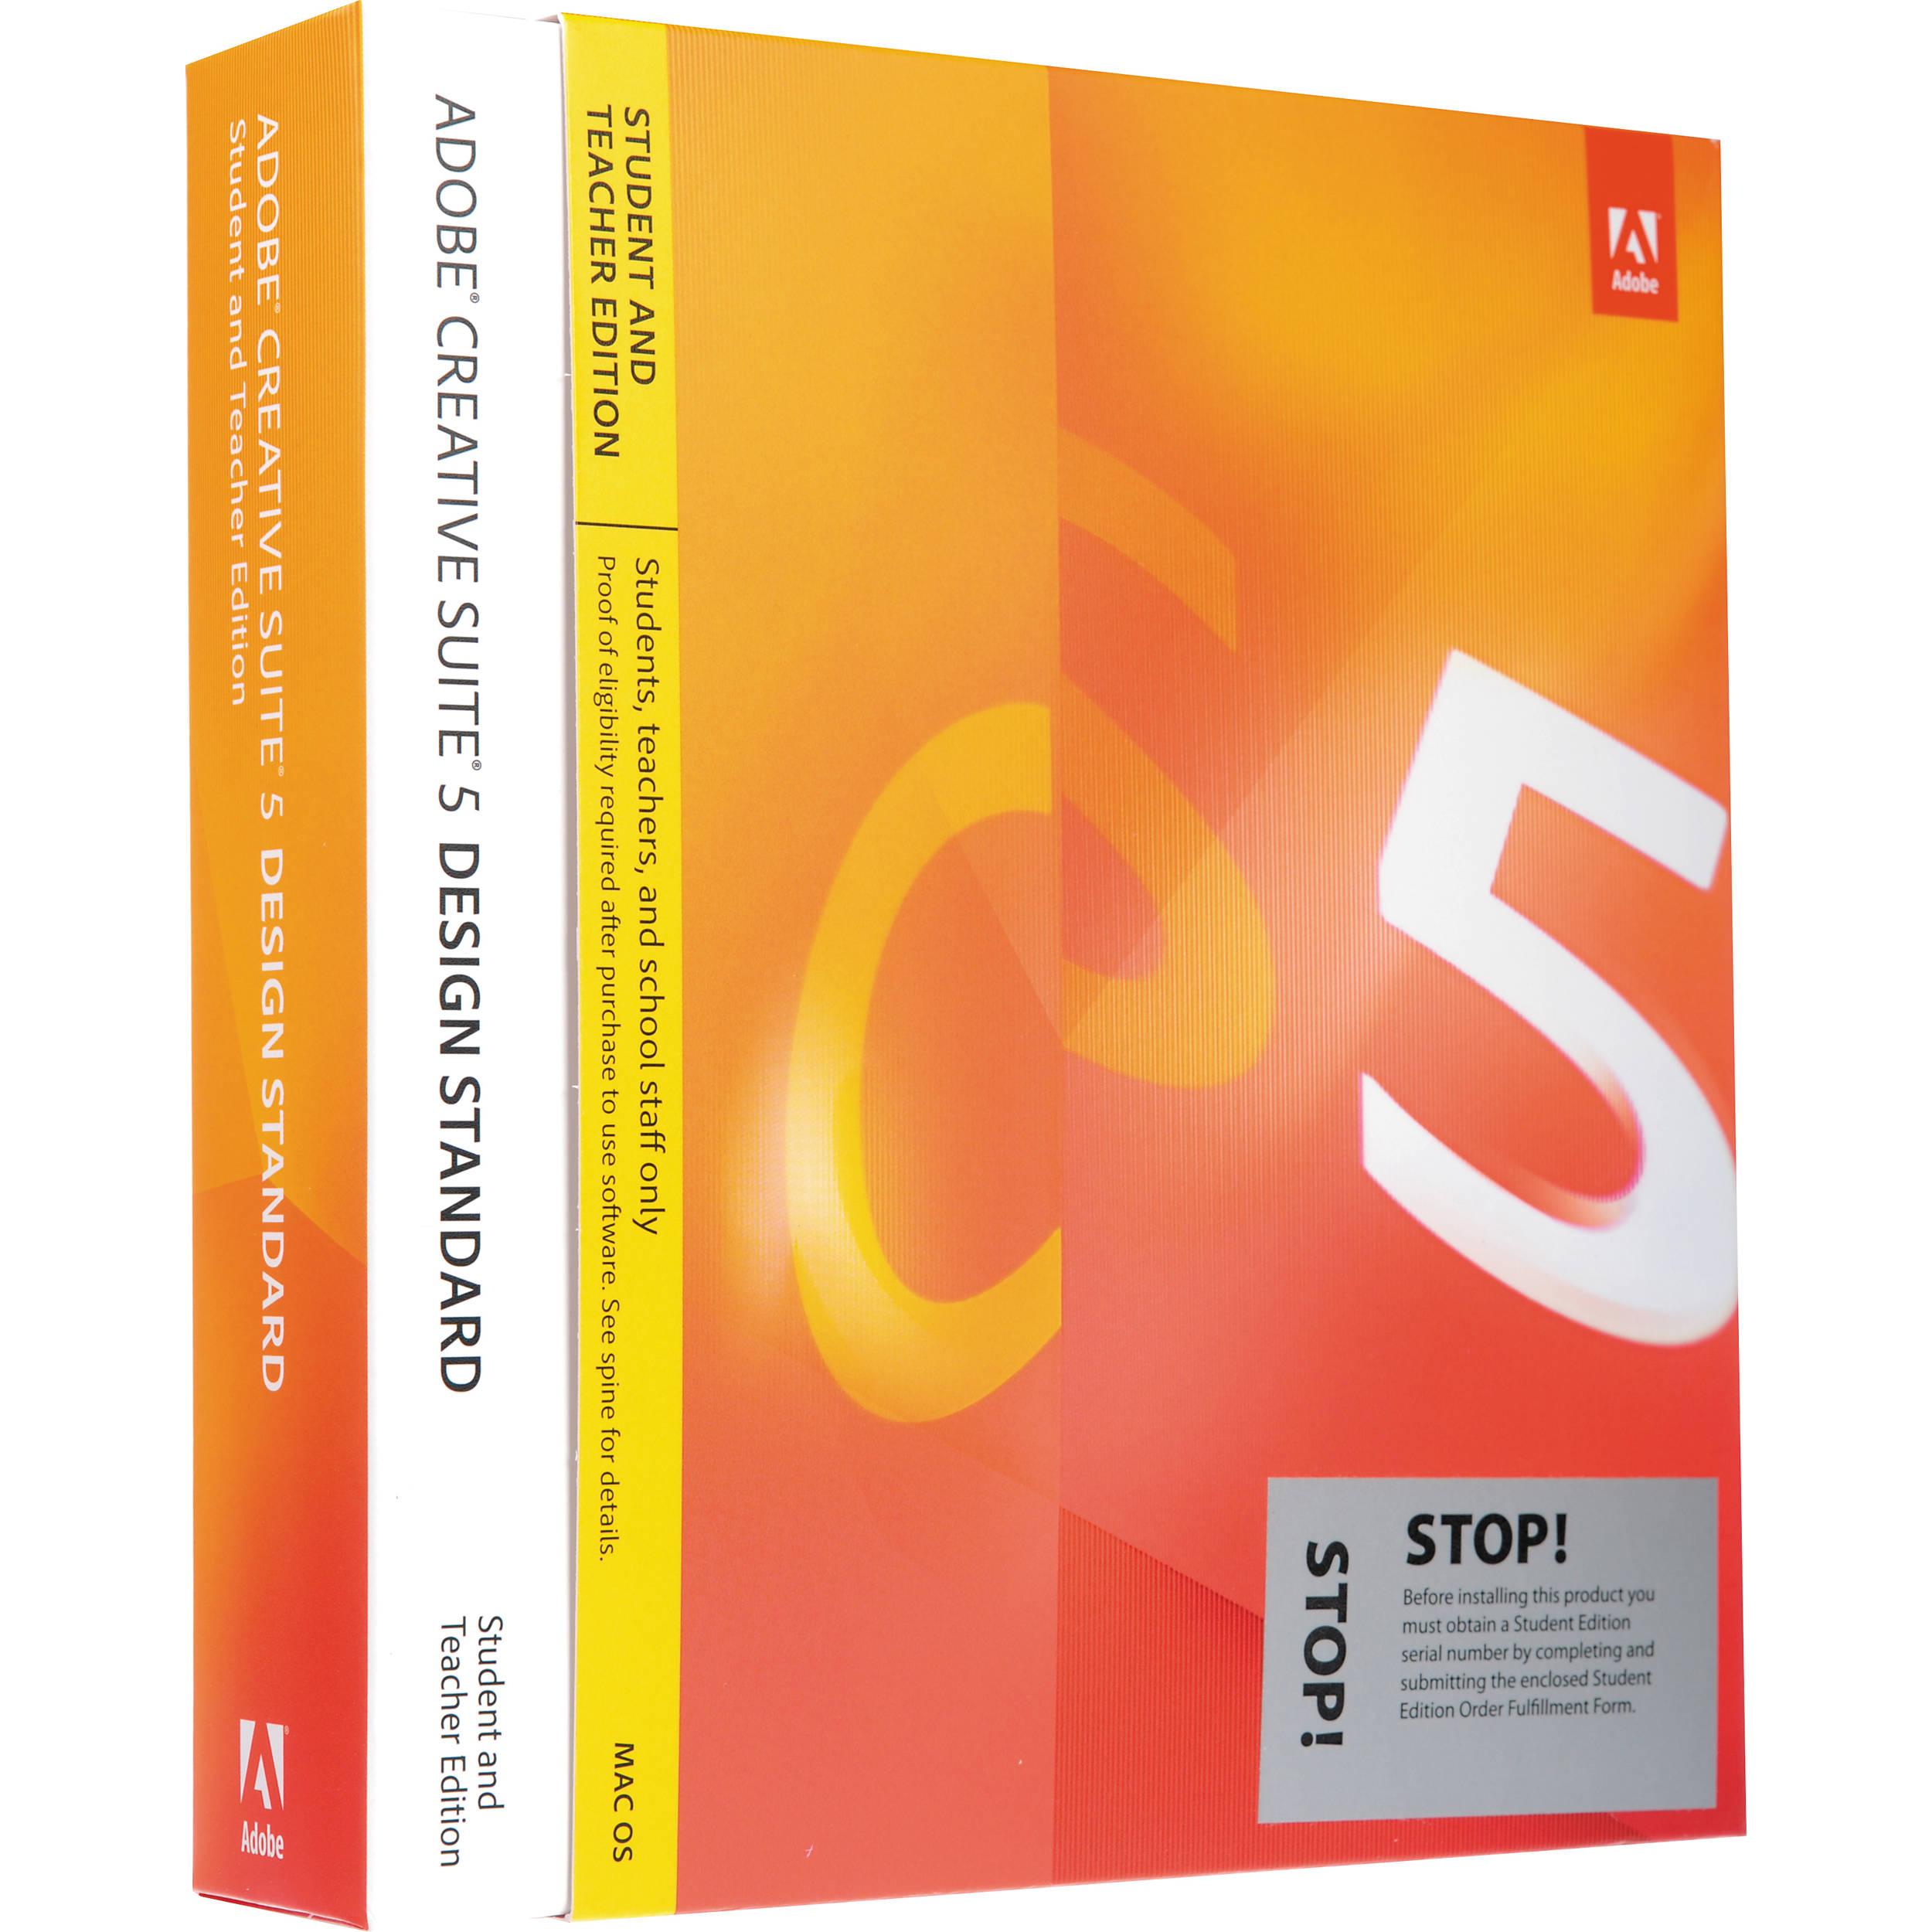 Buy Cheap Adobe CS5.5 Design Standard